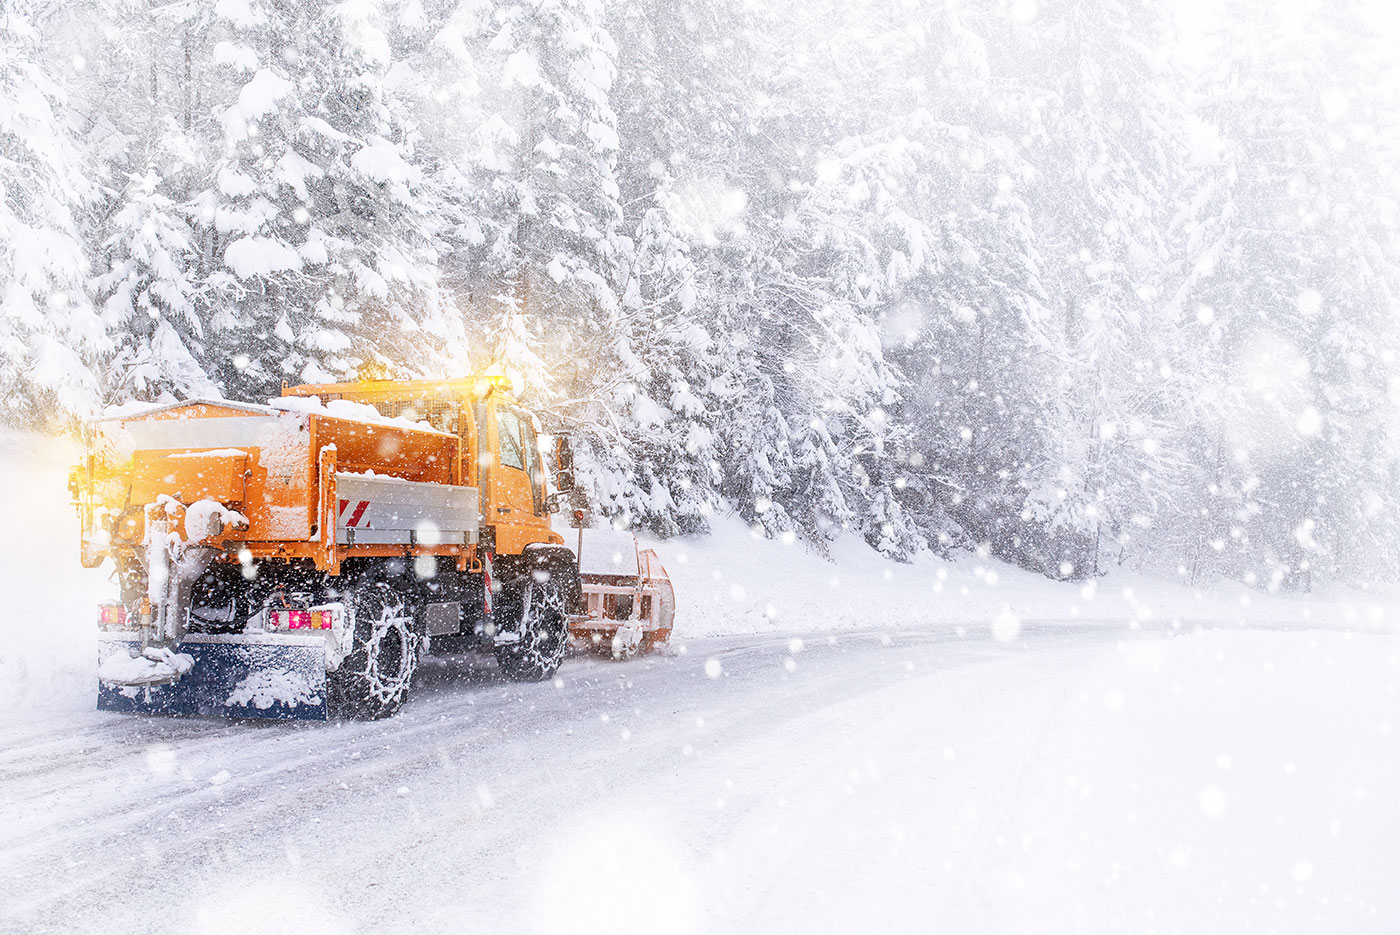 Snow Removal Service in Belleville, MI